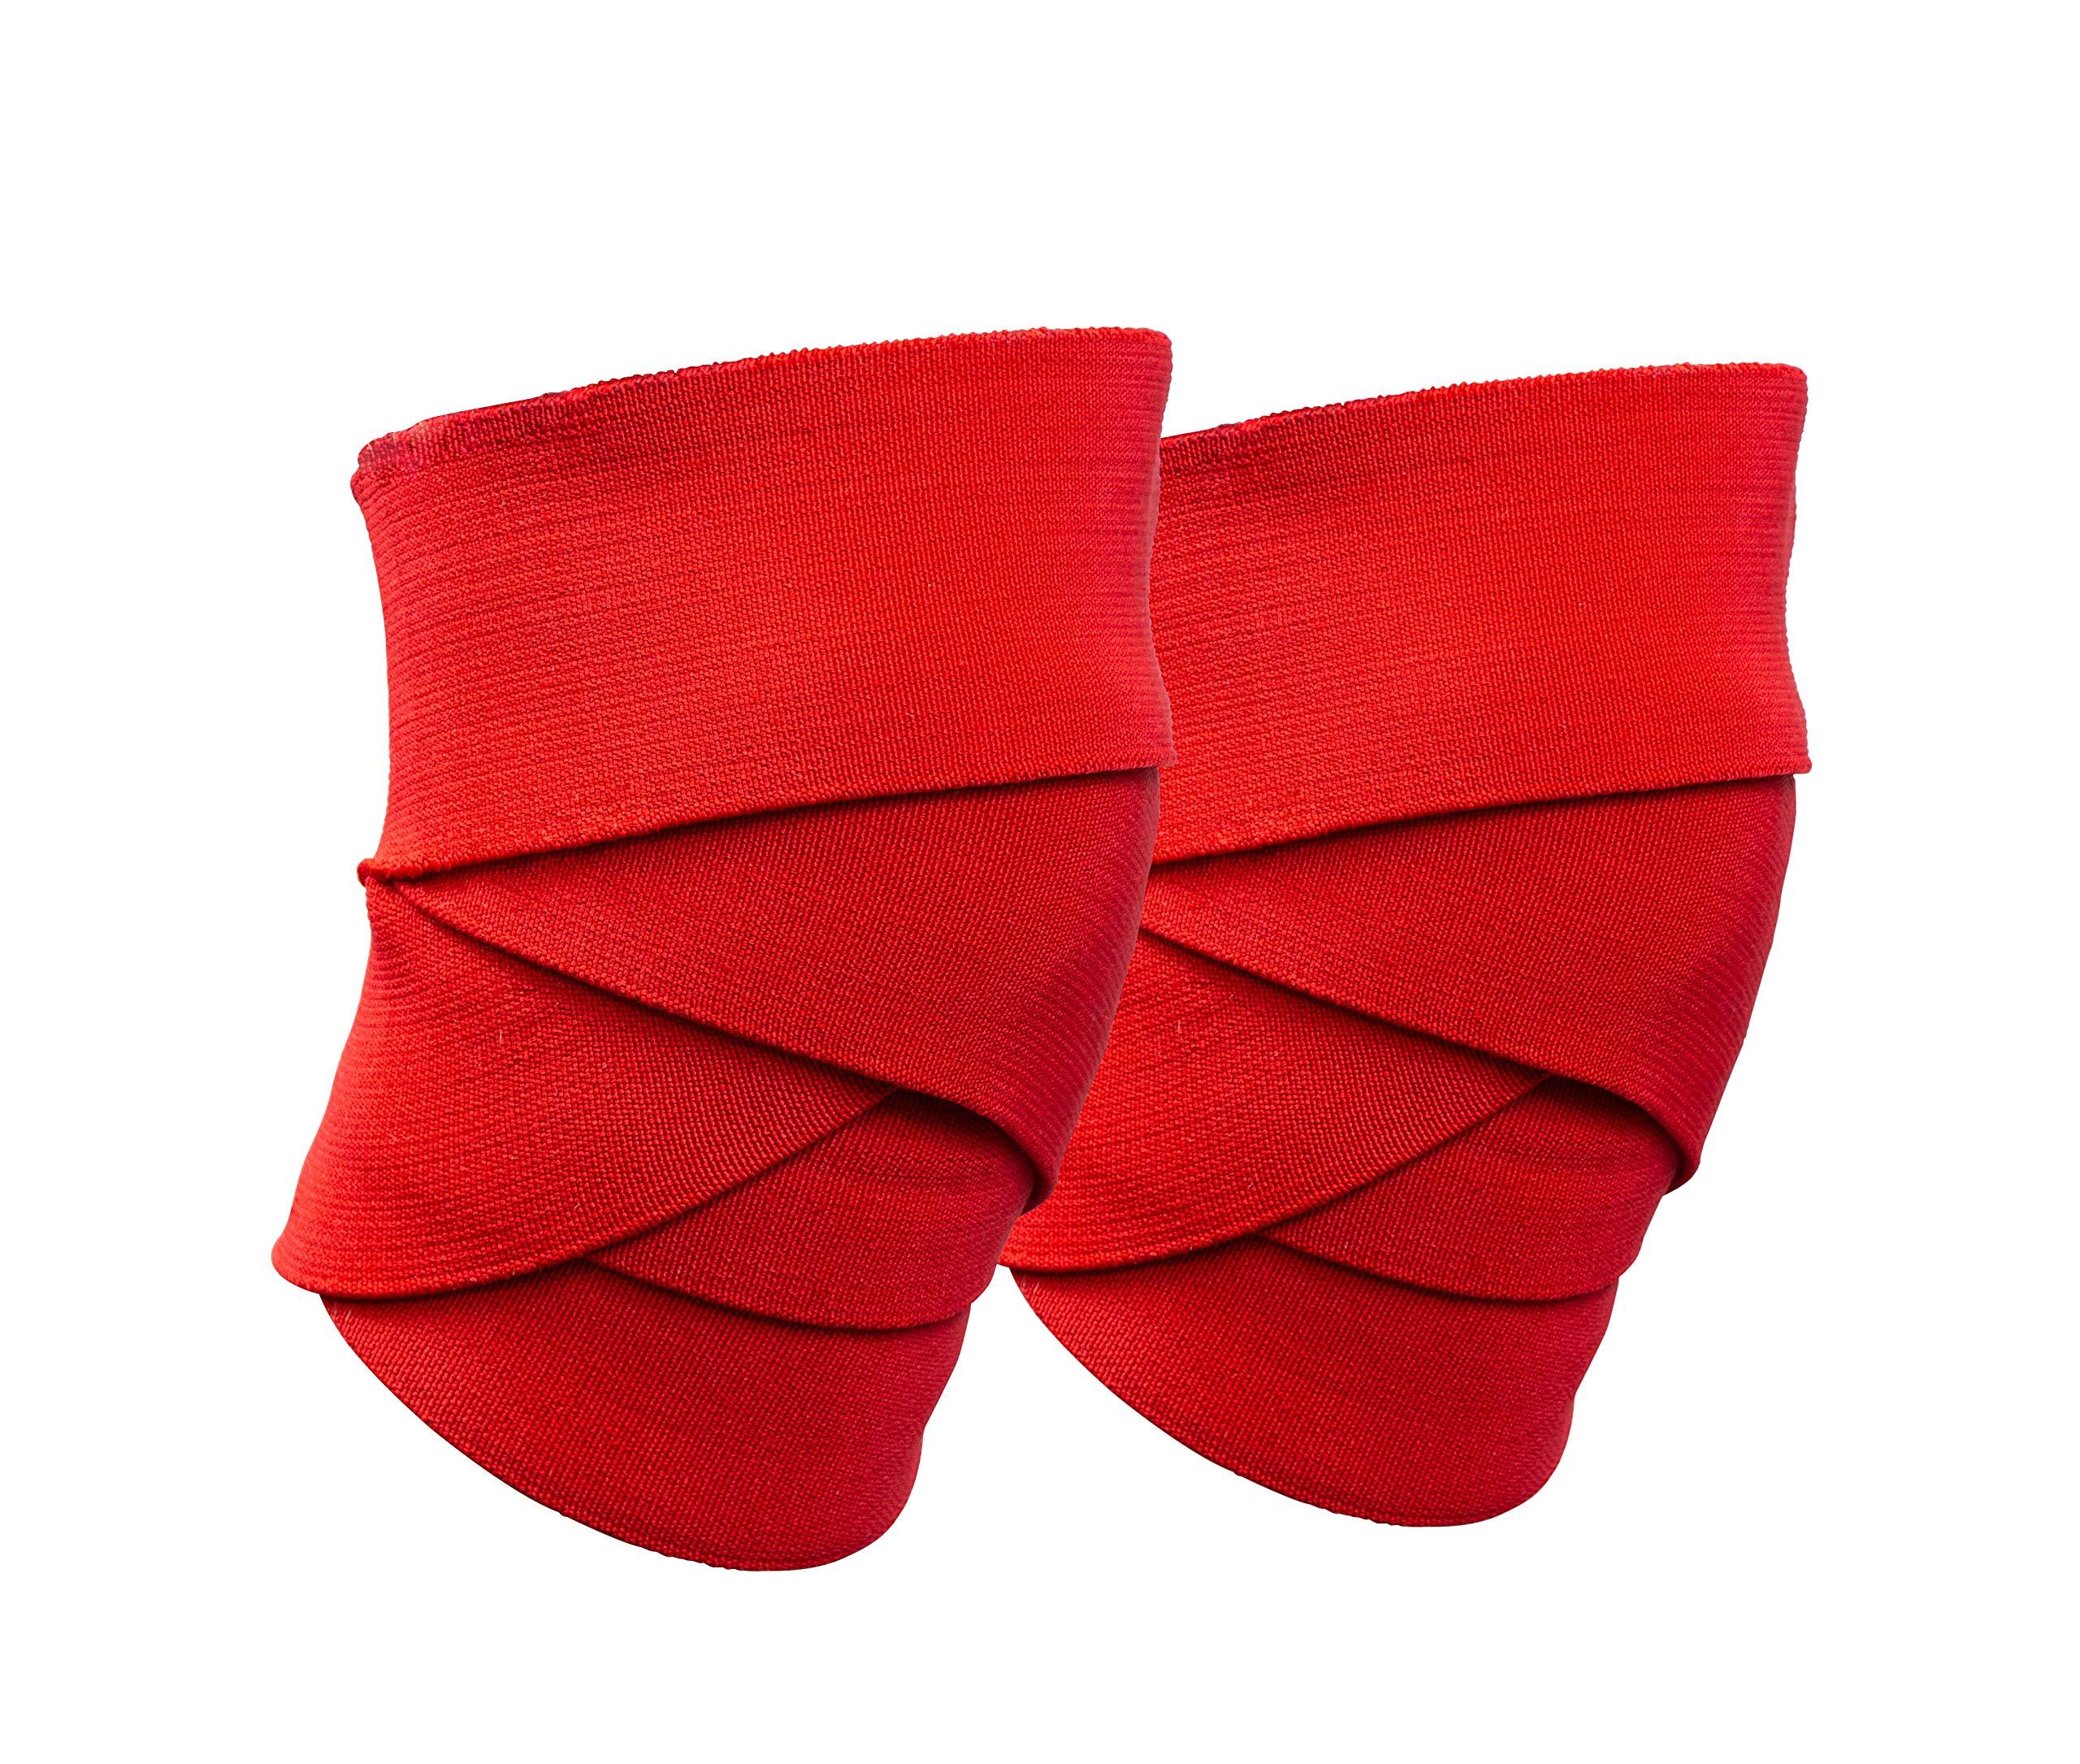 Serious Steel Fitness Comp Knee Wraps (2.5 Meters)